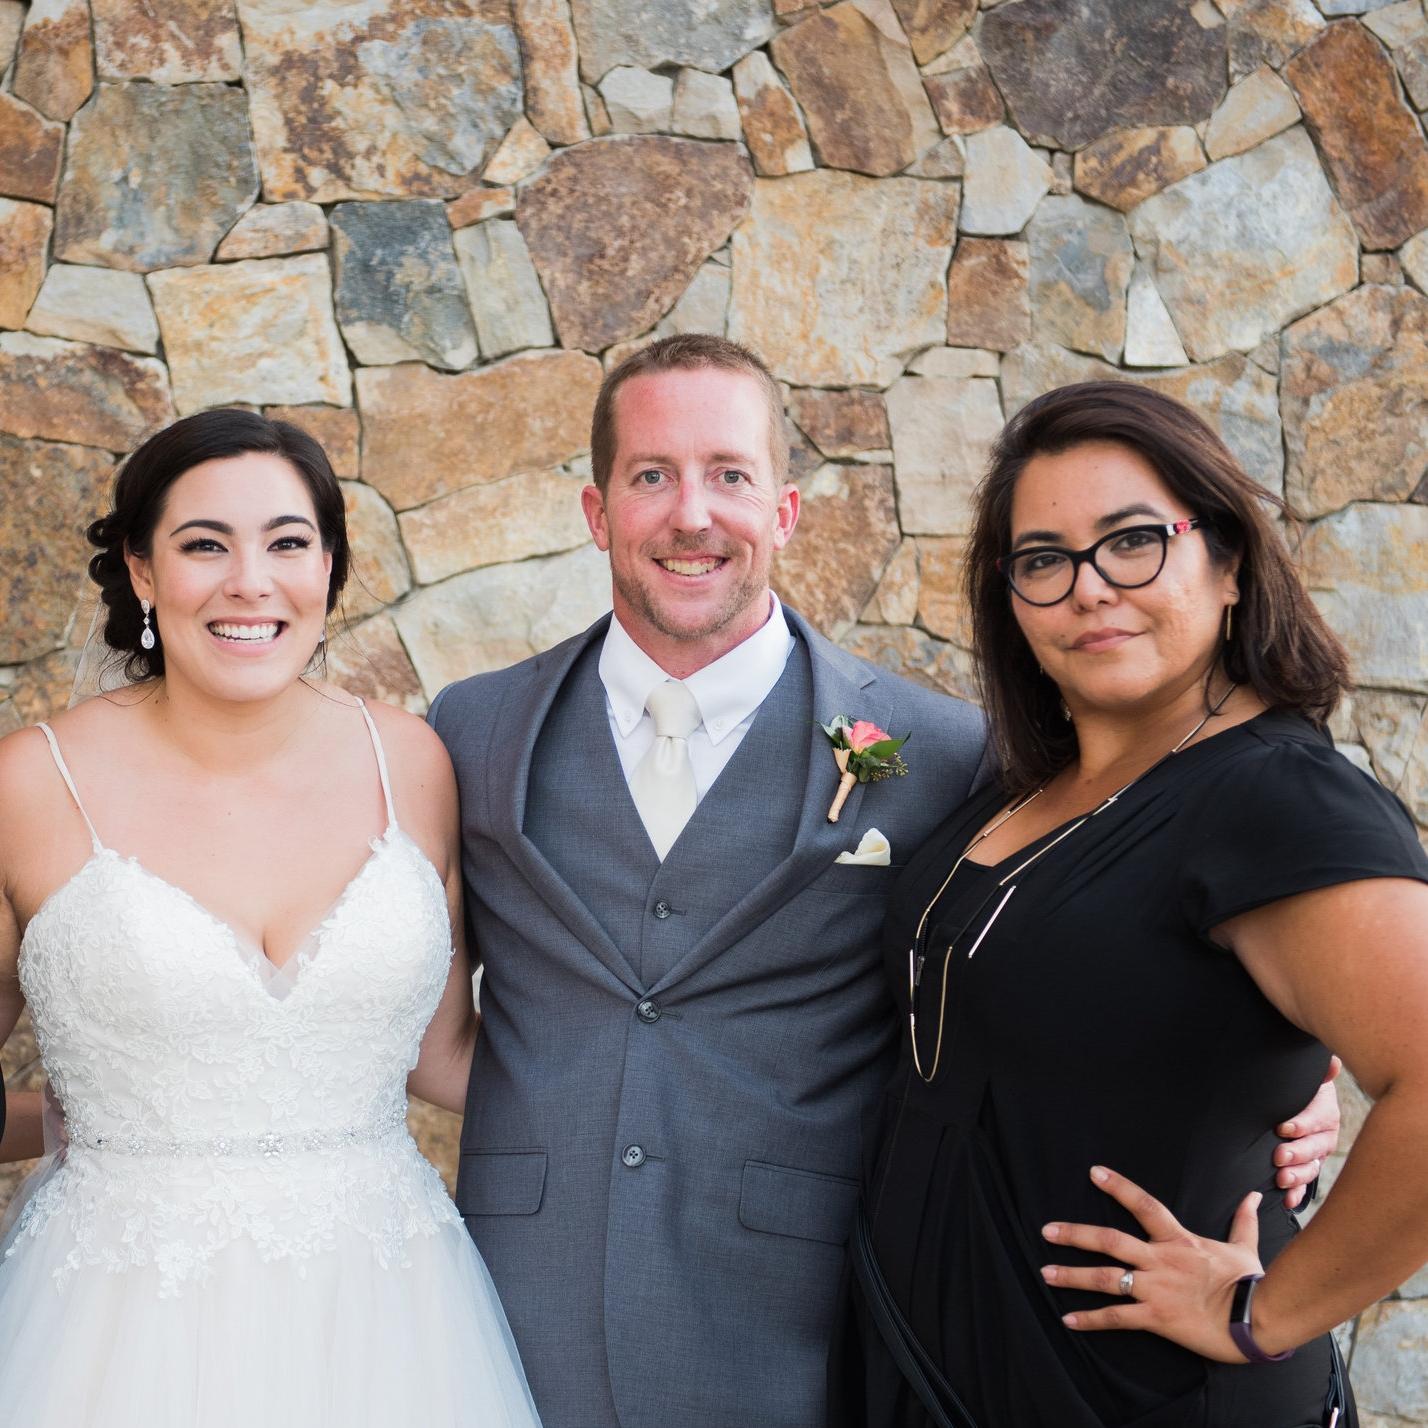 Pacific-Coast-Grill-Beach-Wedding-Olivia-Kevin-2016-566.jpg